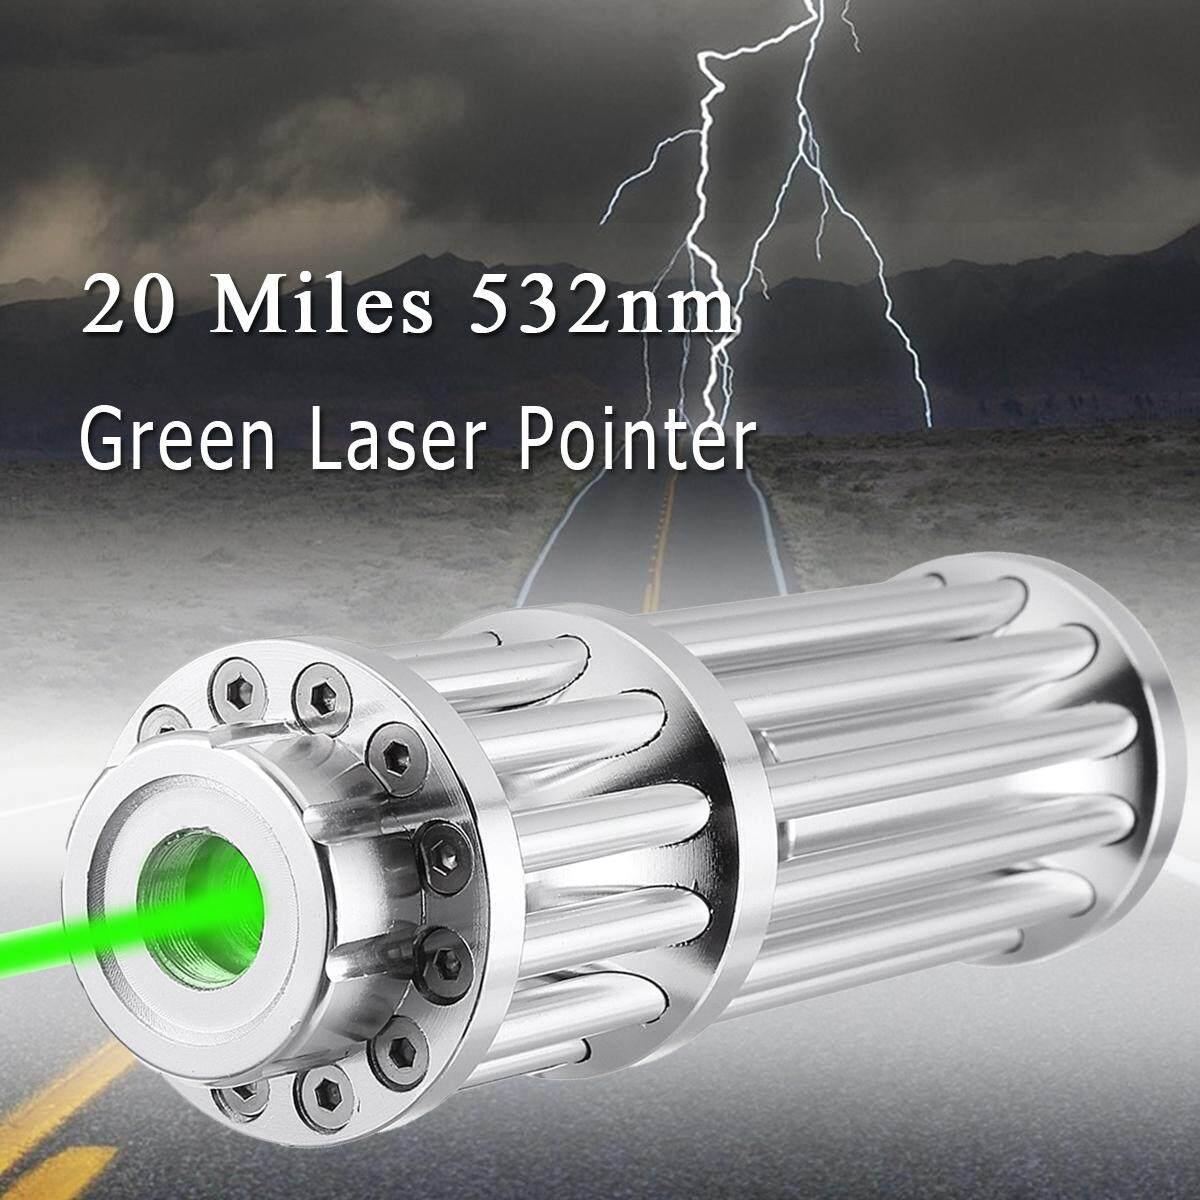 20 Miles 532nm Green Laser Pointer Point Pen Lazer Beam Light 0.5mW